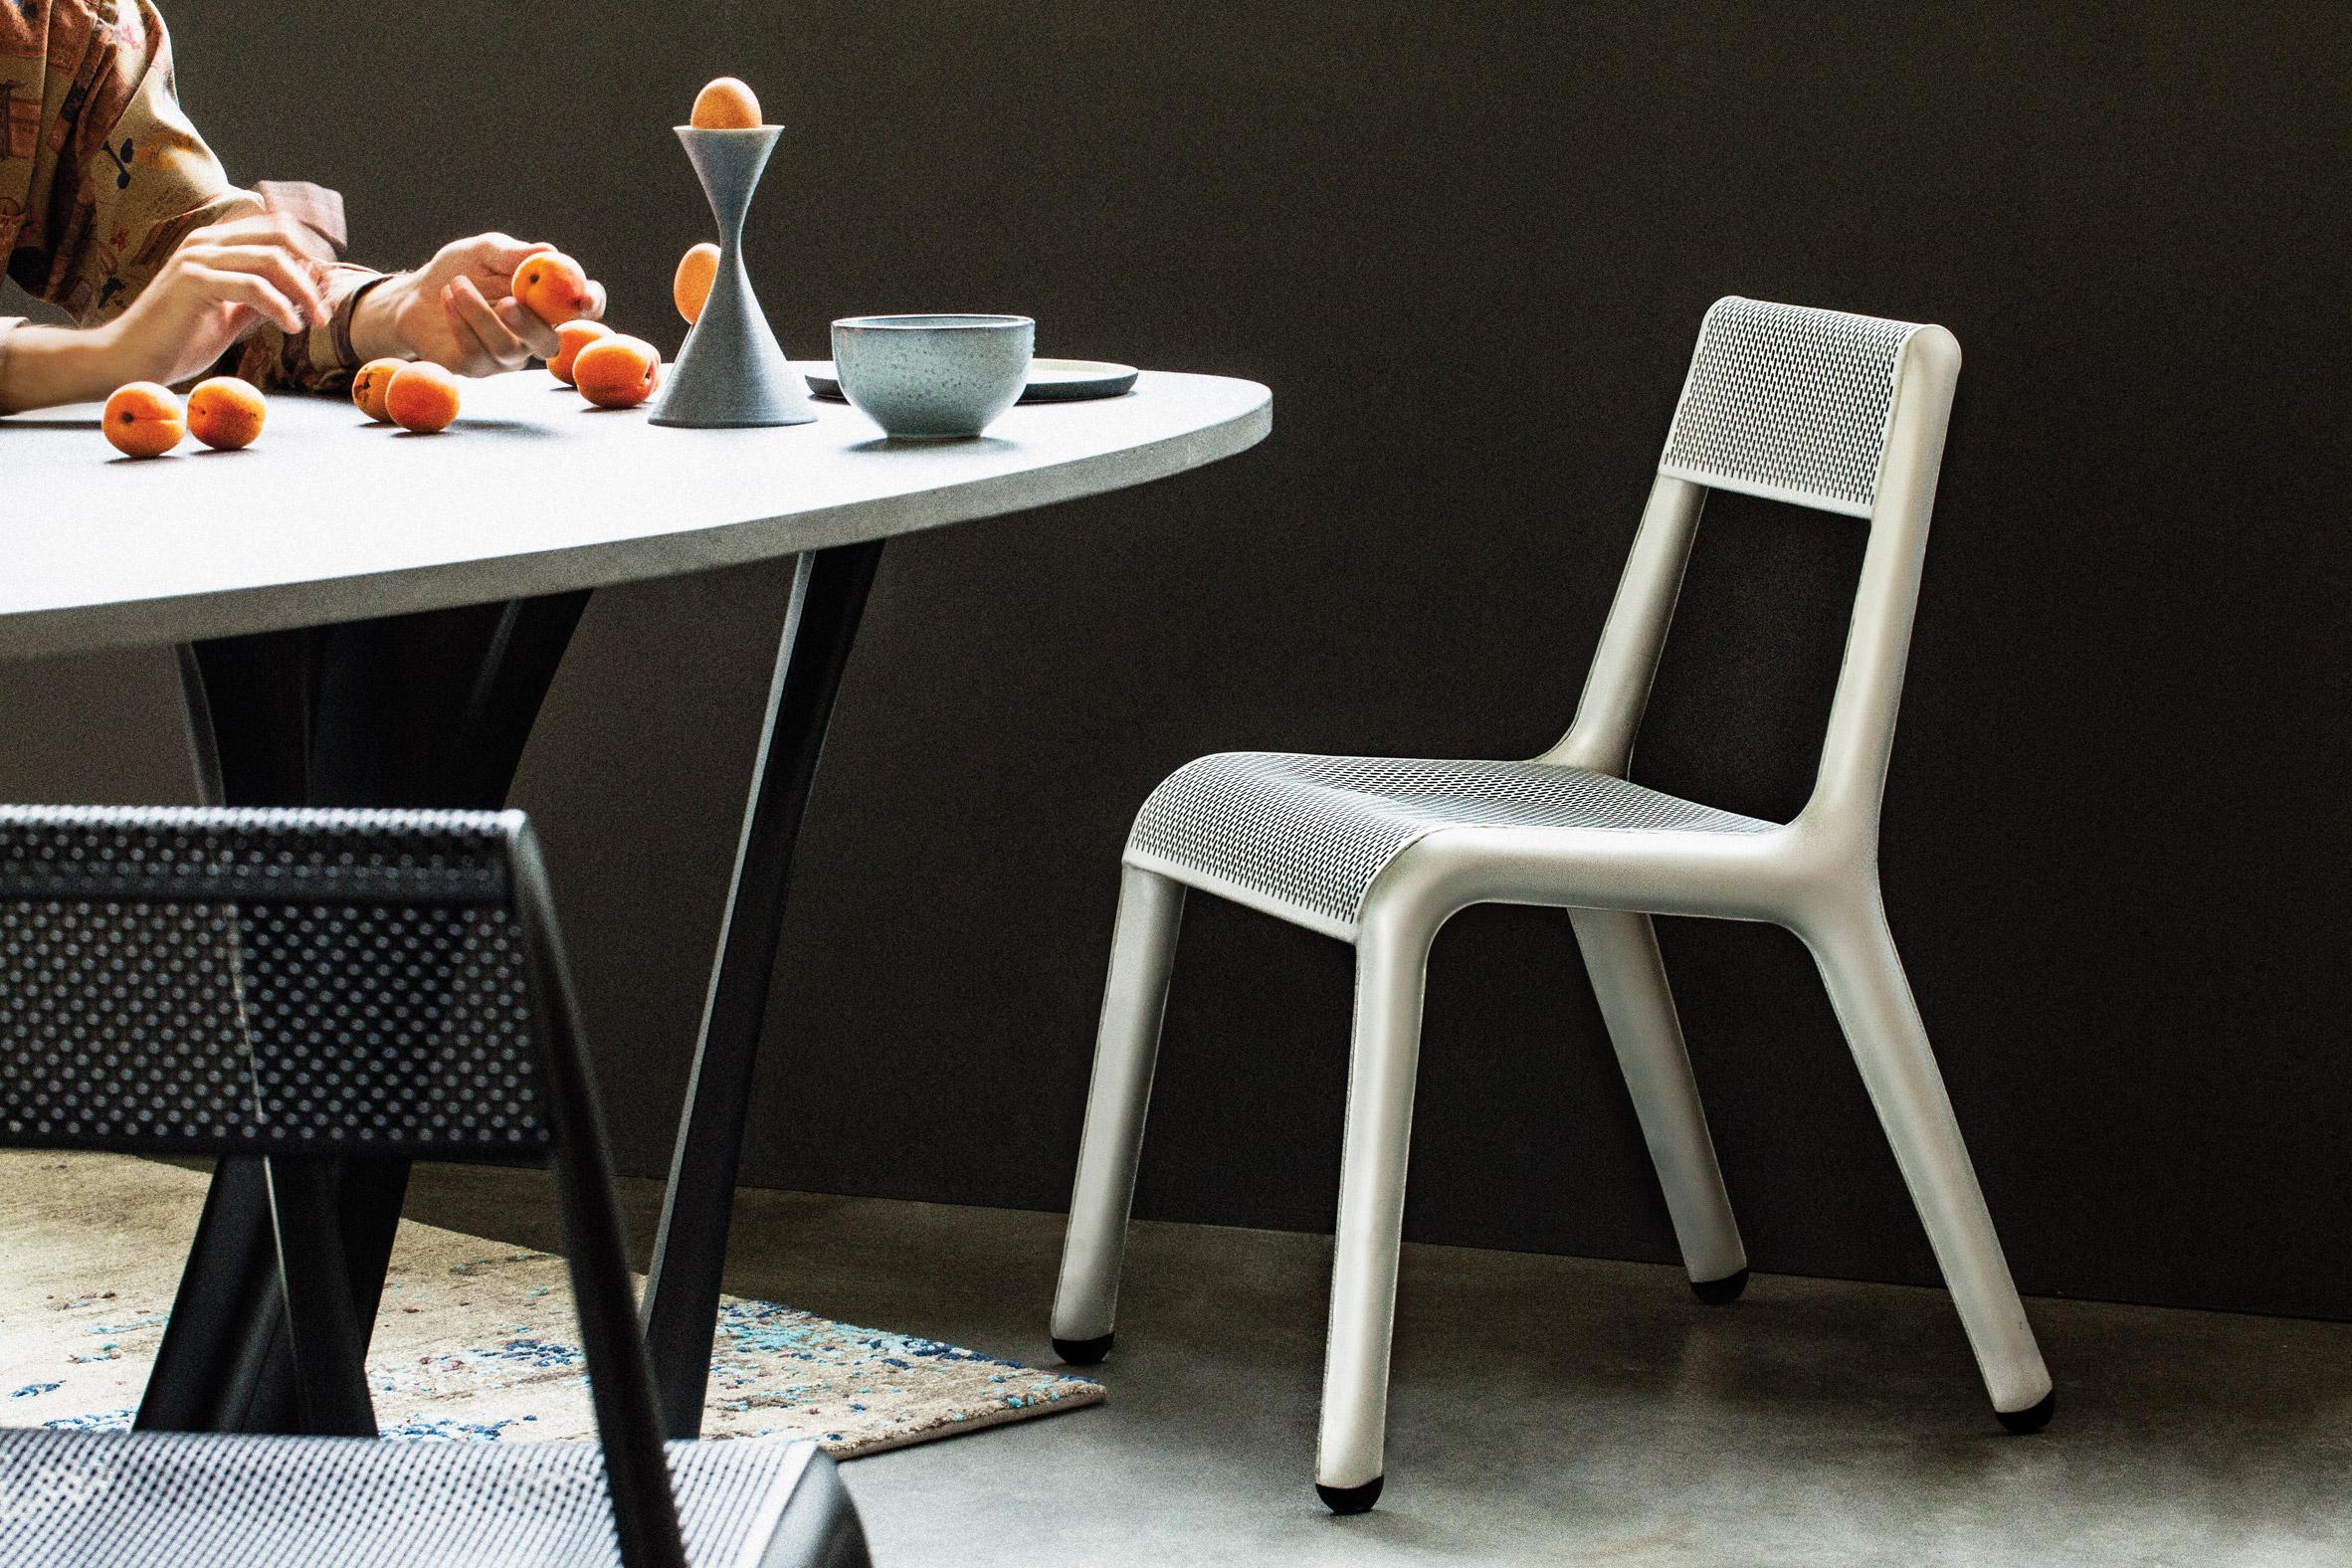 Studio Zieta's Ultraleggera chair in silver and black